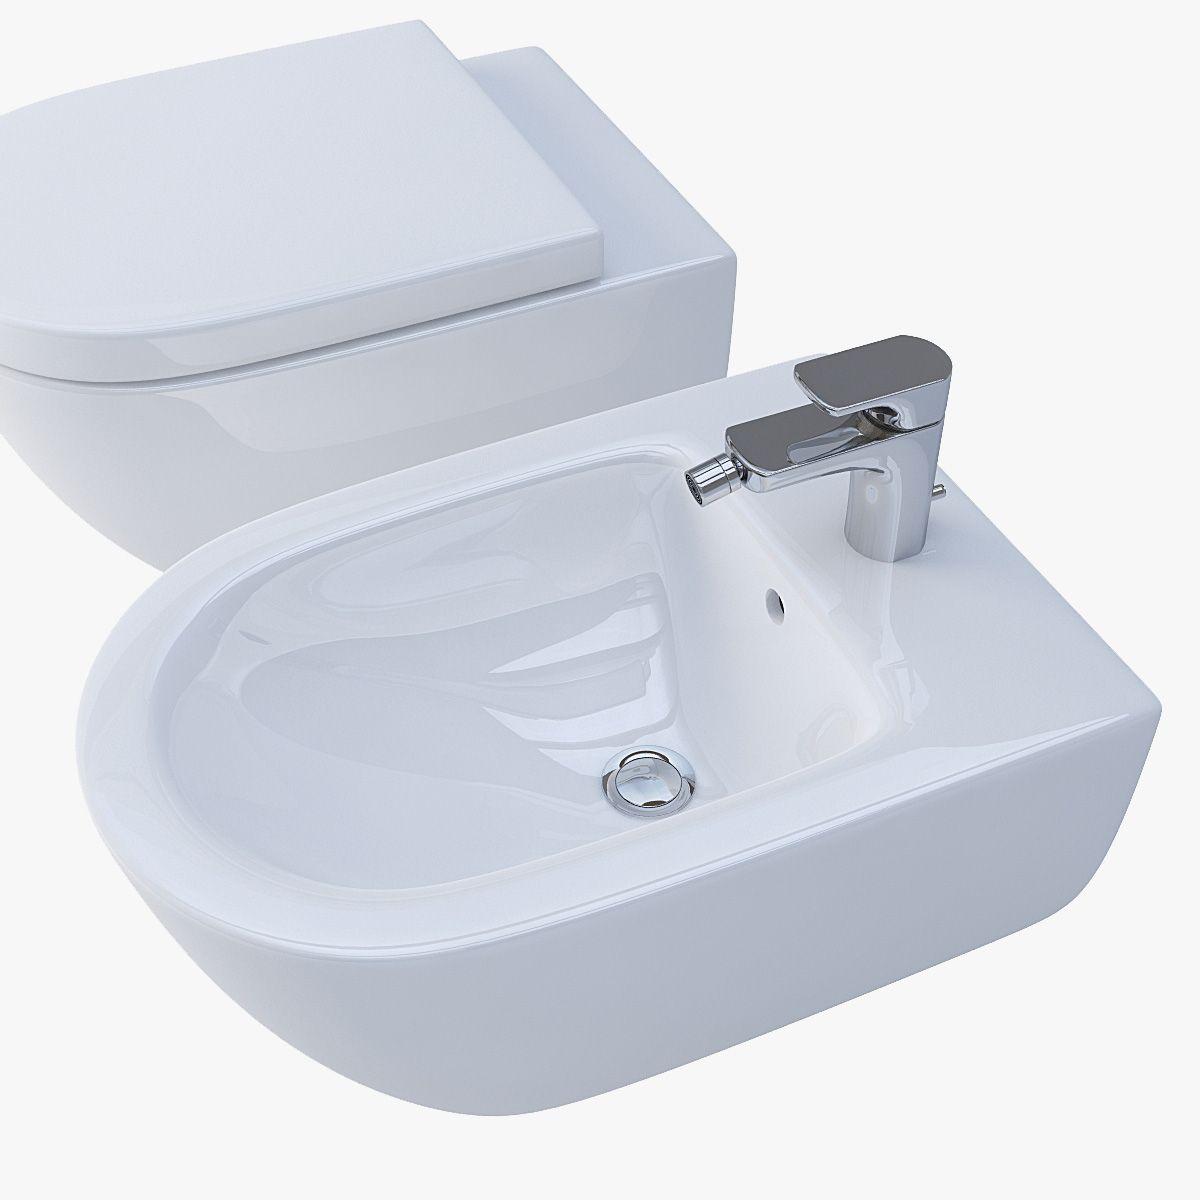 Toilet Bidet Villeroy Boch Subway Bidet Amp Toilet Subway